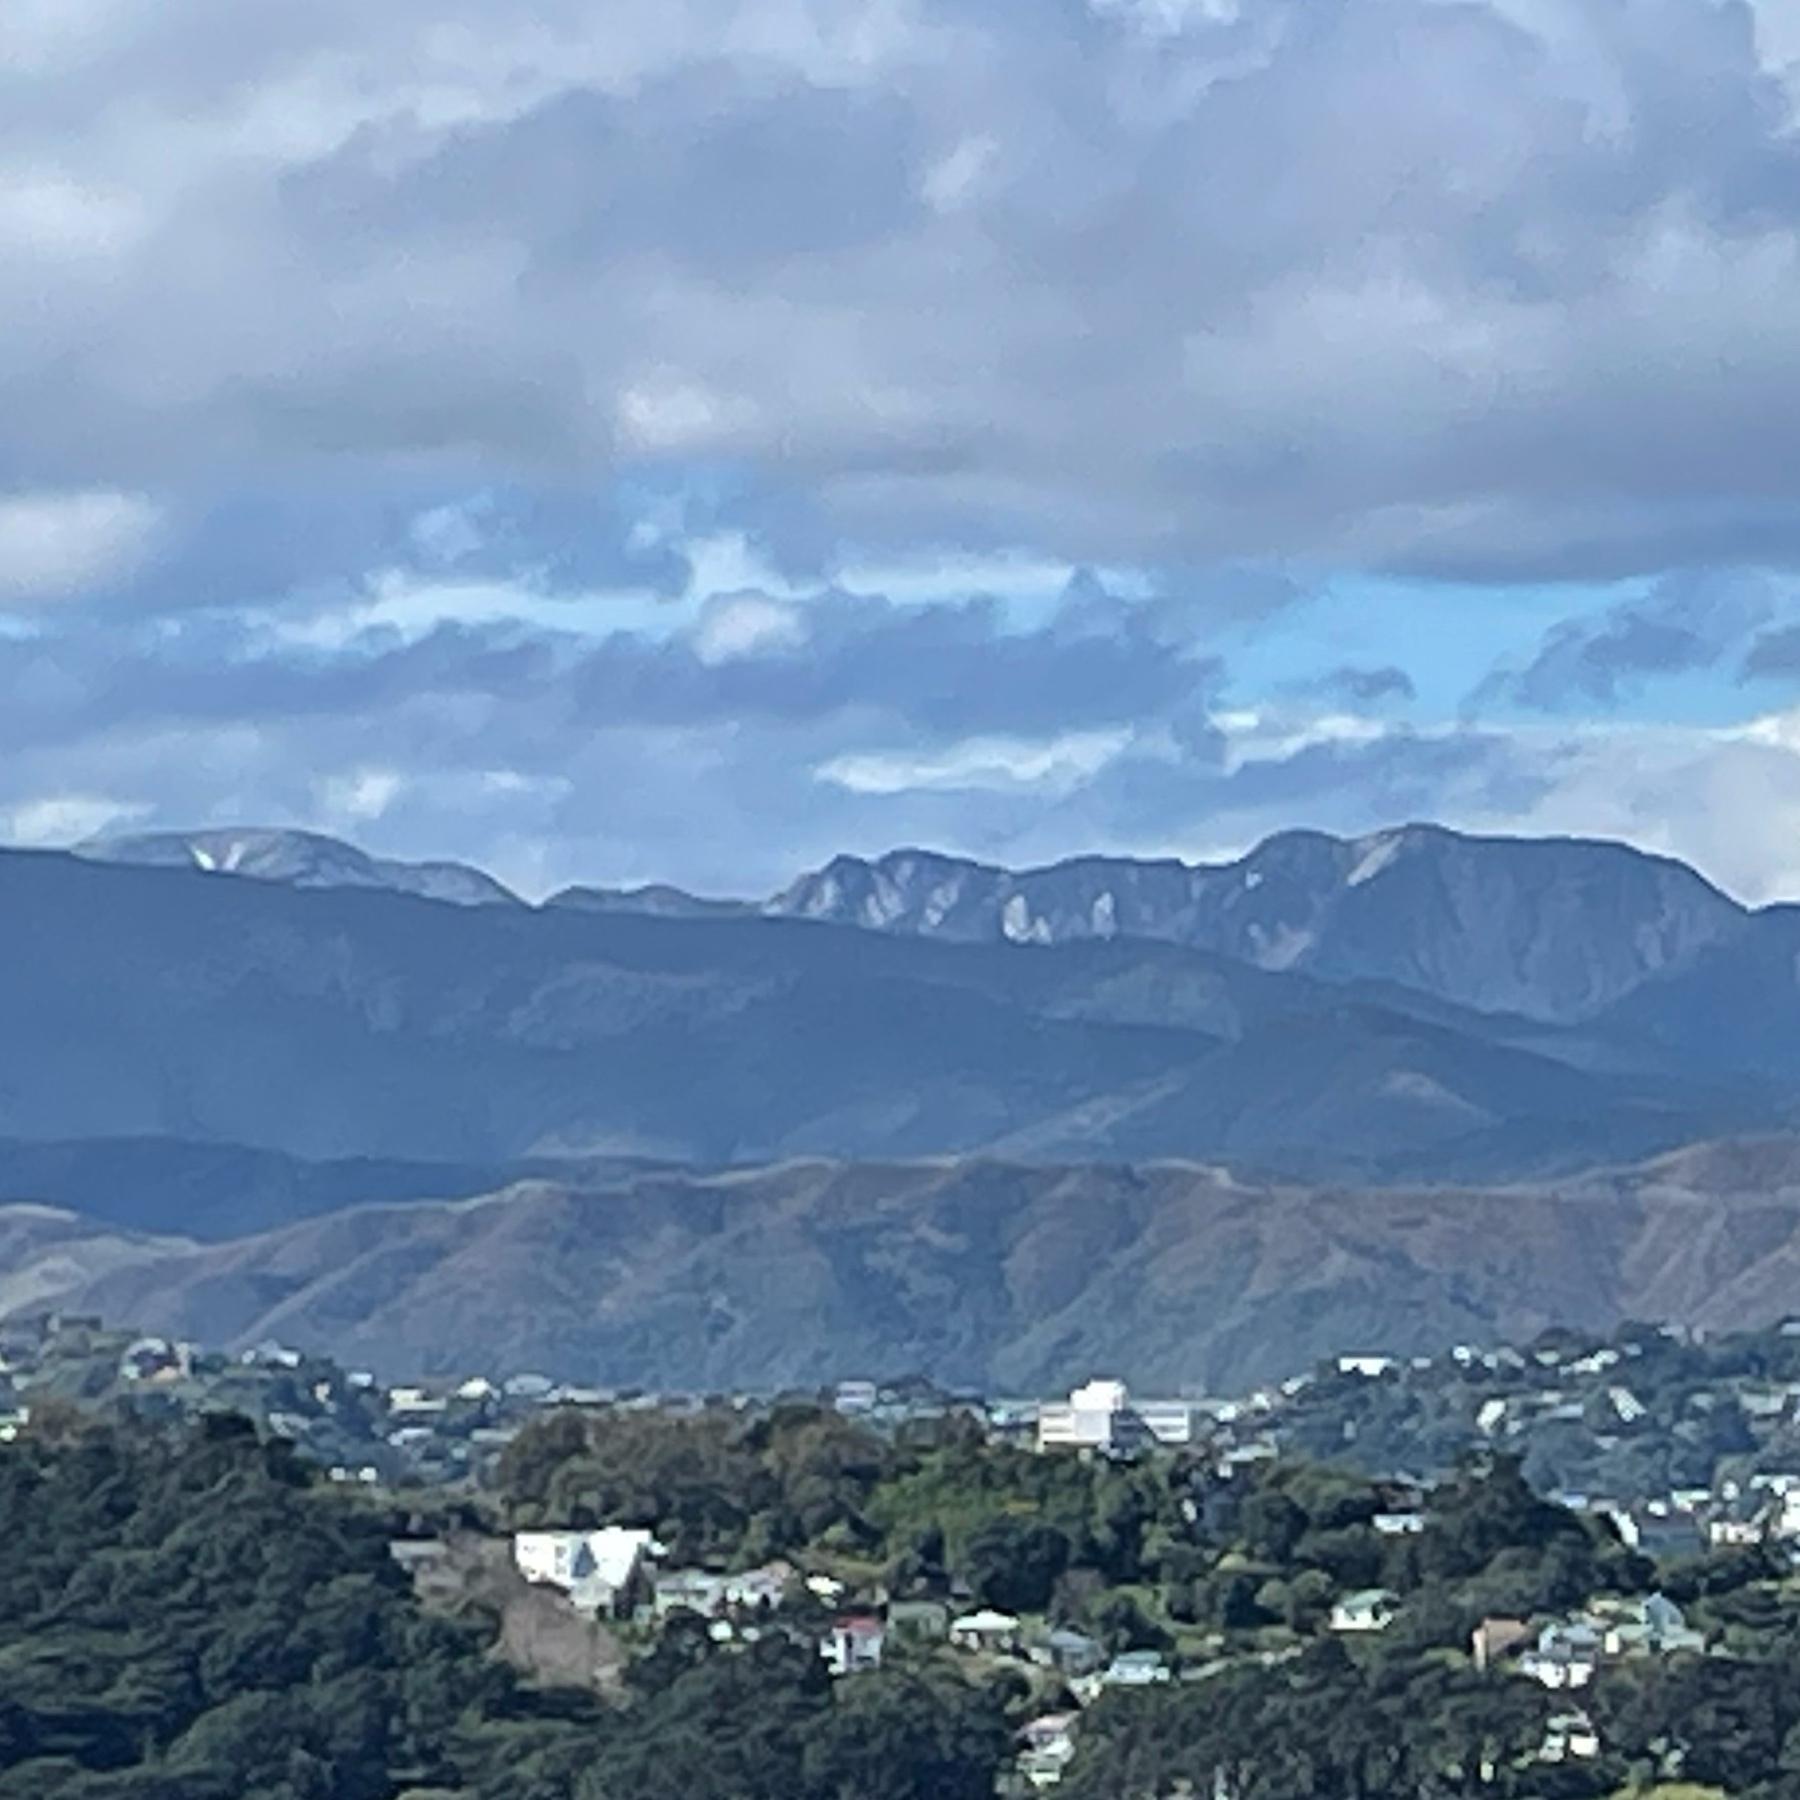 The Remutaka mountain range, east of Pōneke (Wellington), pictured from the western hills of Pōneke